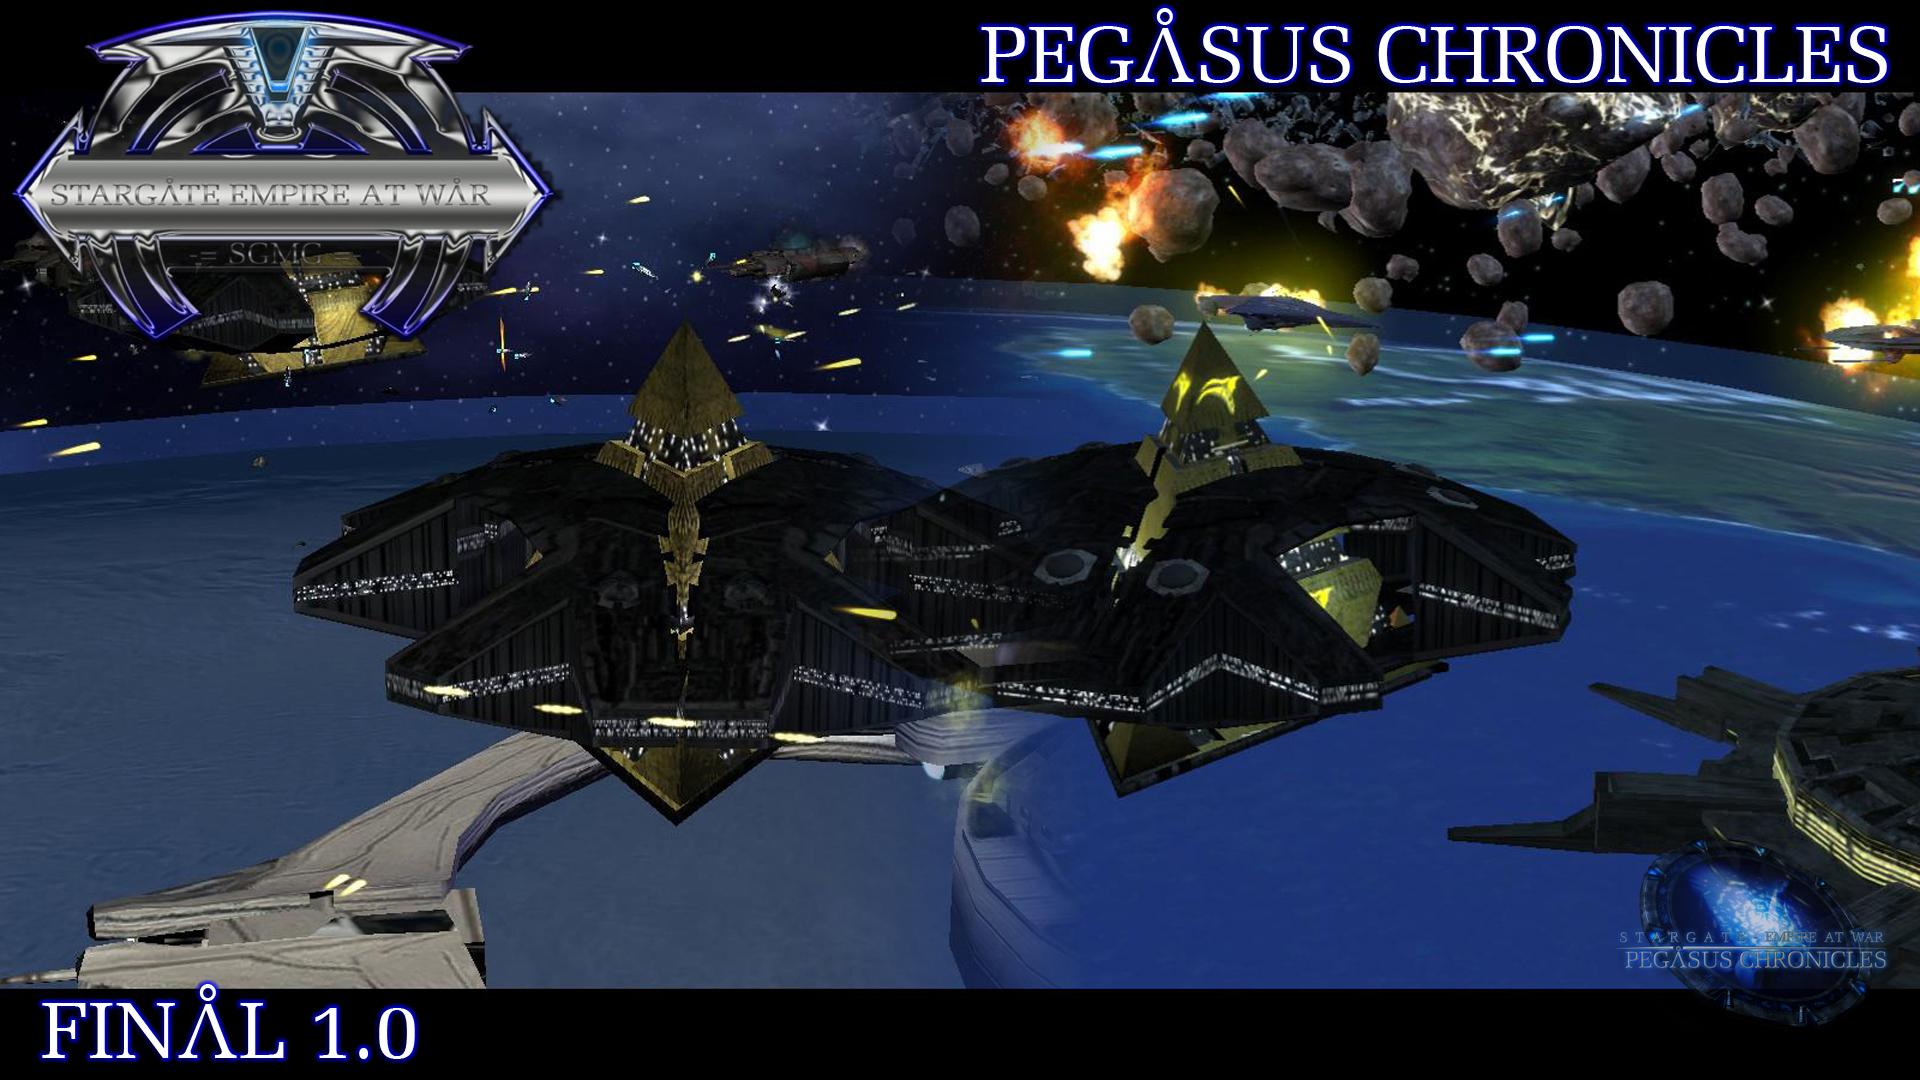 stargate empire at war pegasus chronicles